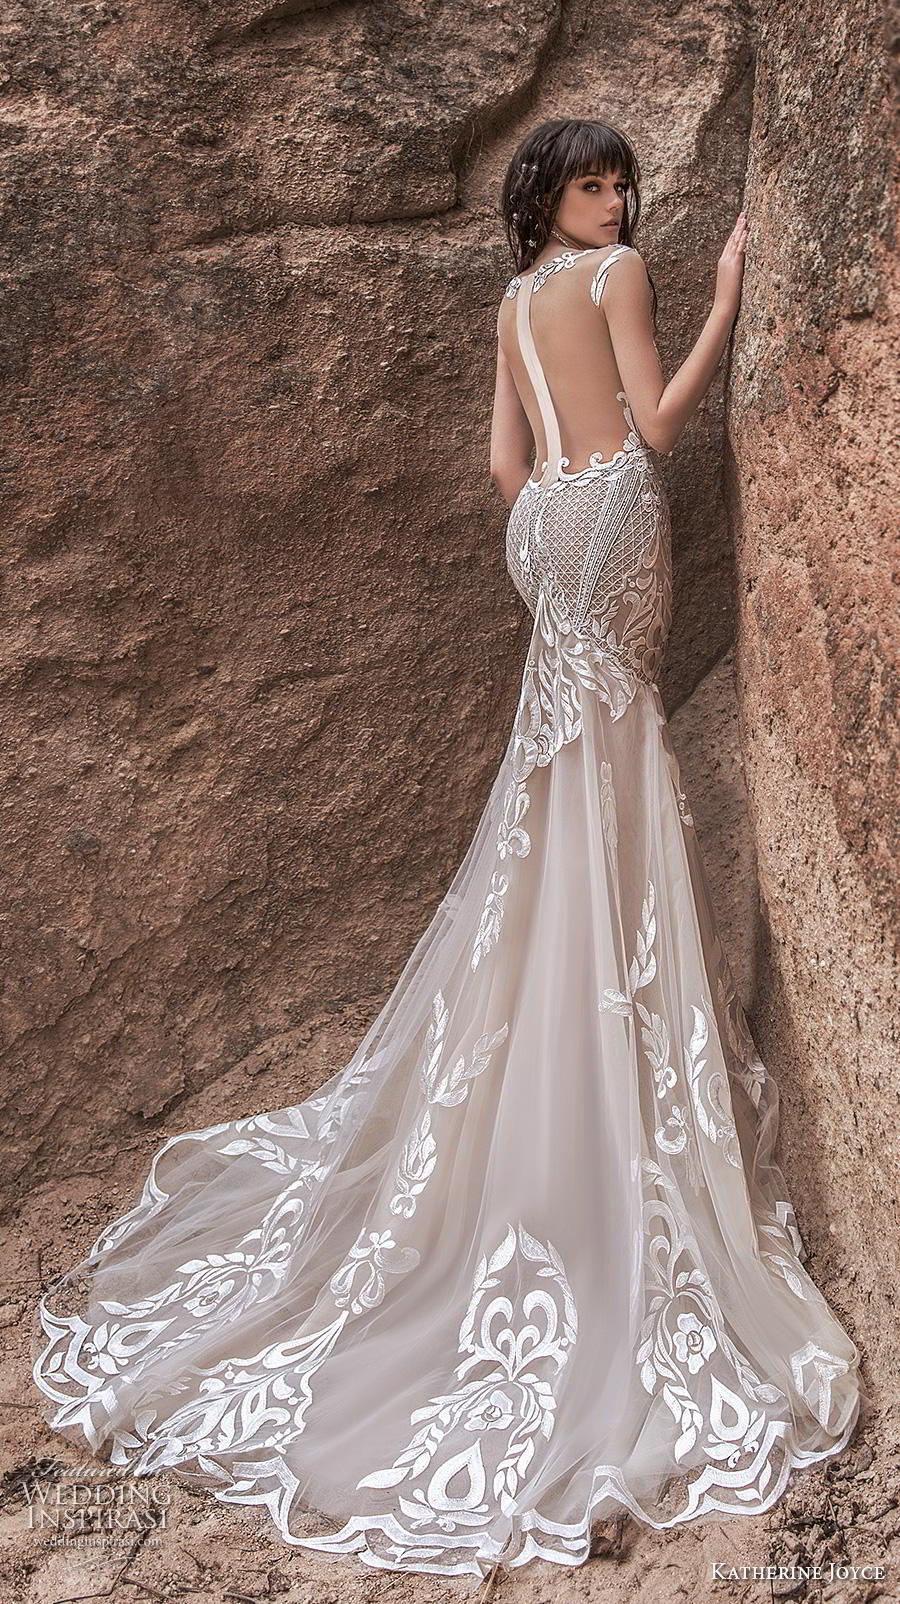 katherine joyce 2020 bridal cap sleeves bateau neckline full embellishment glamorous elegant ivory mermaid wedding dress sheer button low back chapel train (7) bv